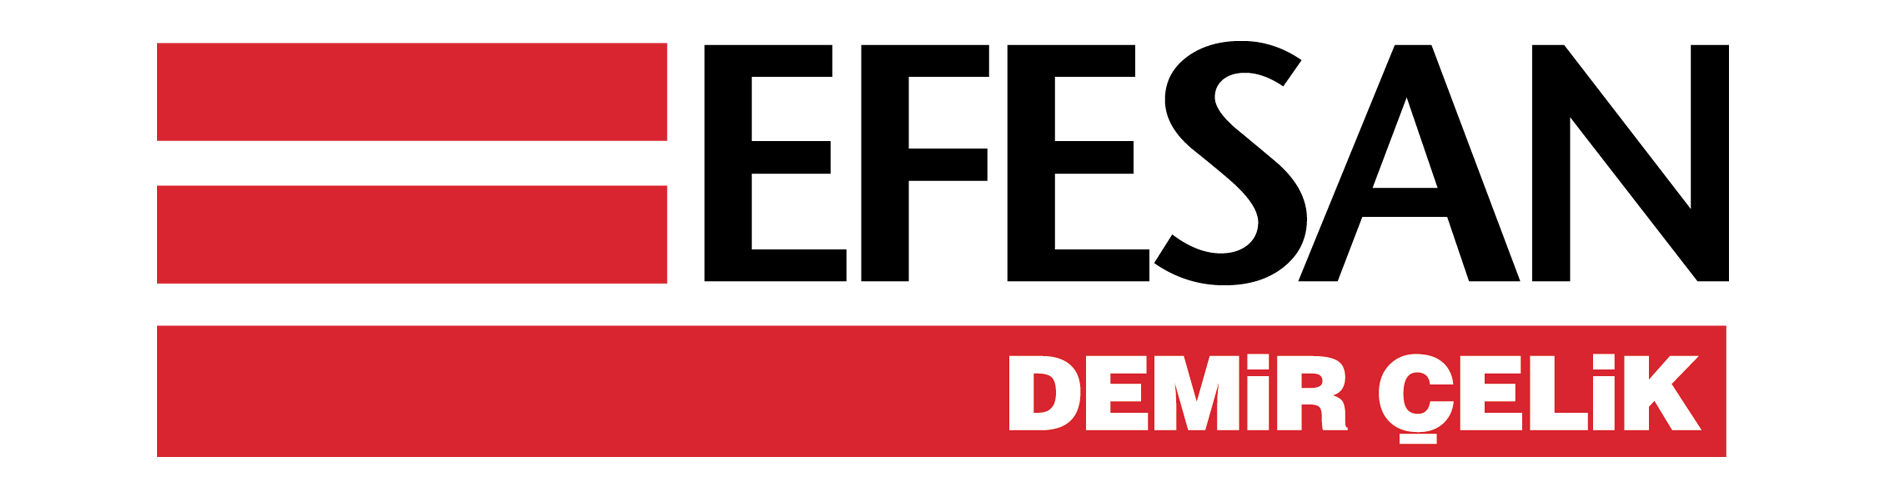 efesan_demircelik_logo_b